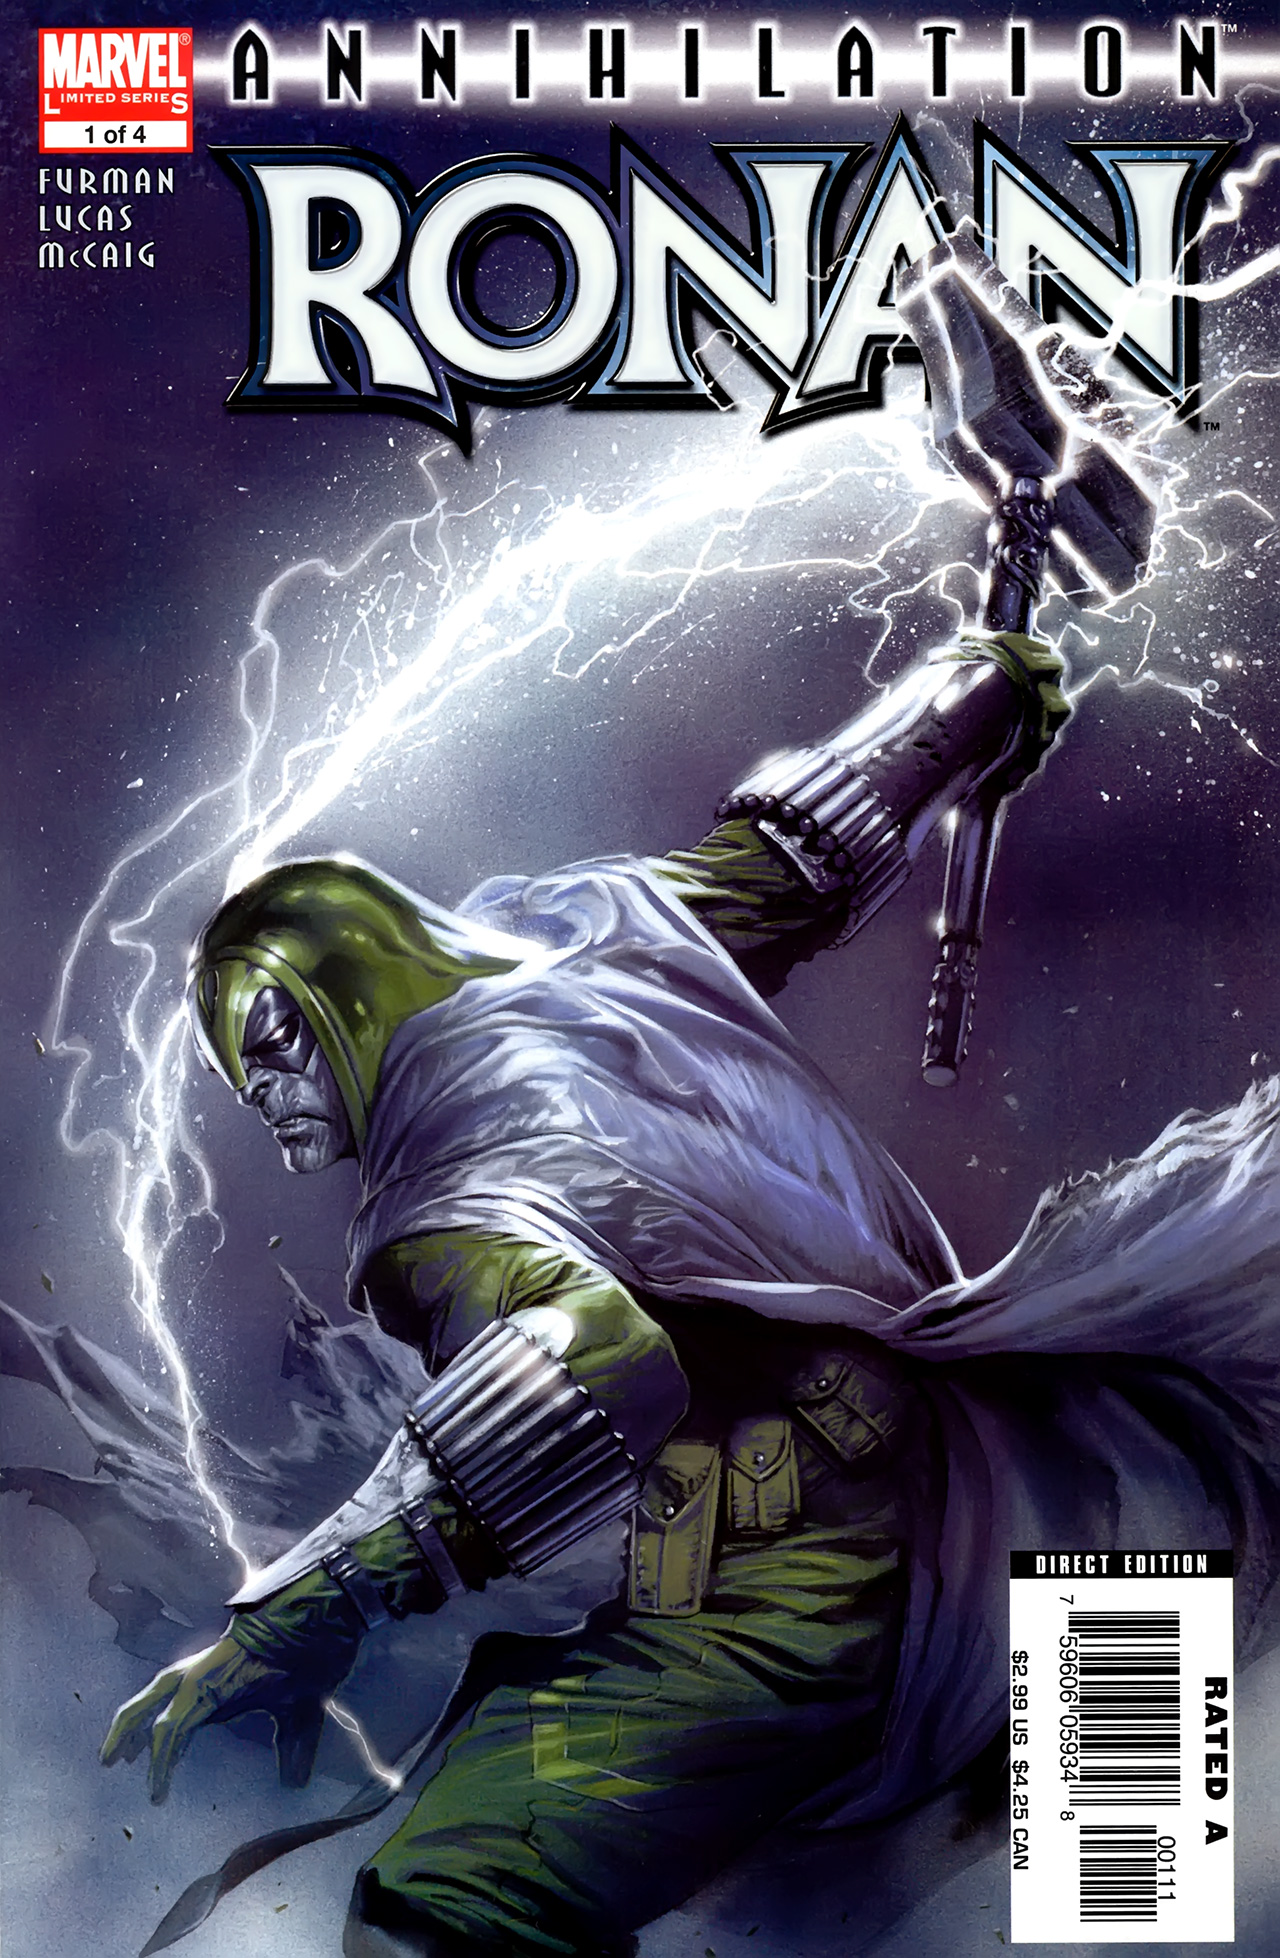 Read online Annihilation: Ronan comic -  Issue #1 - 1